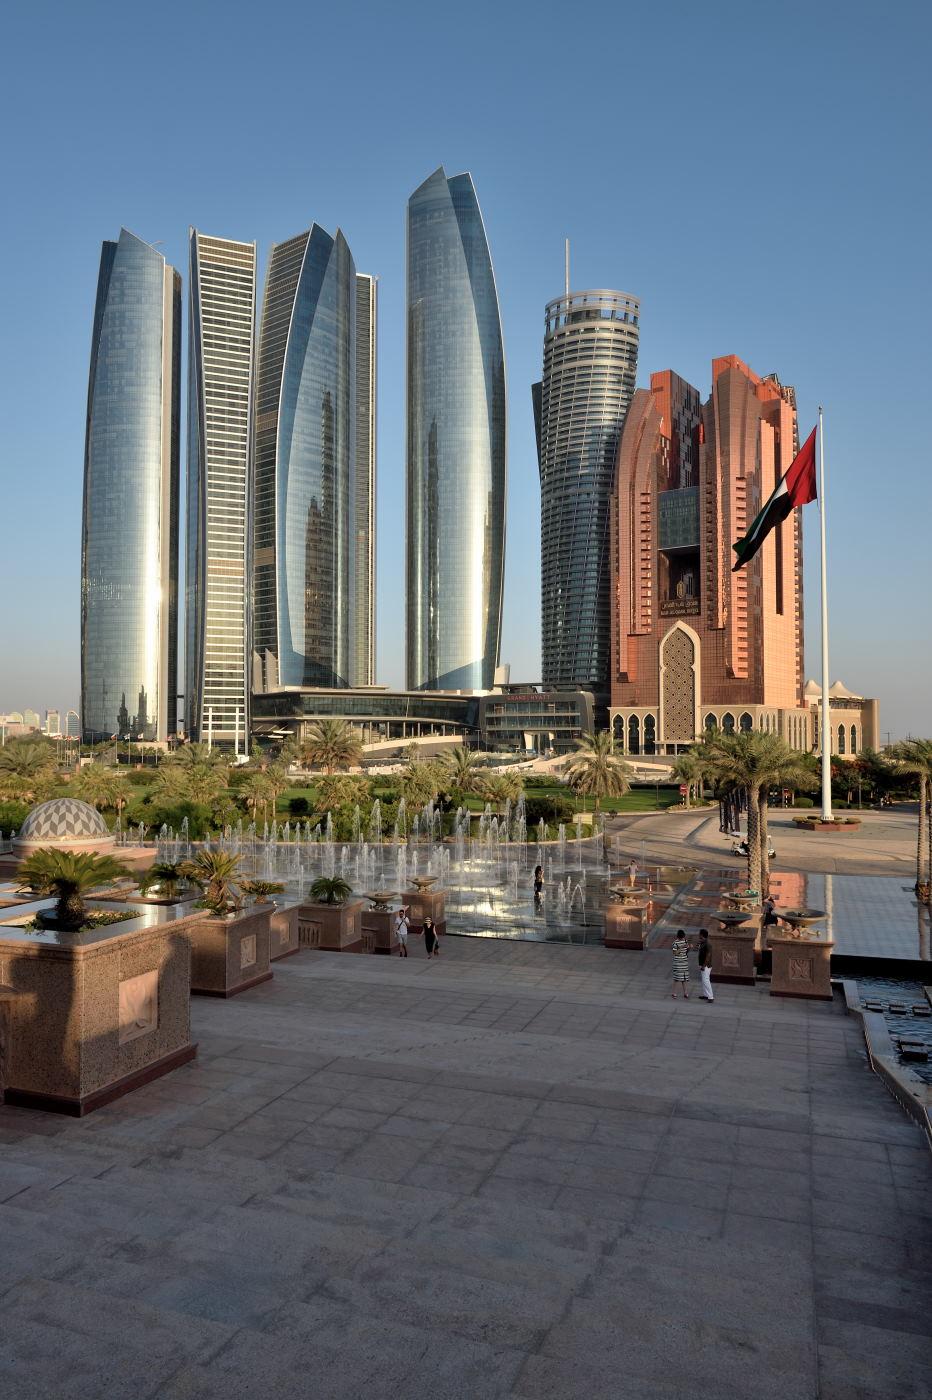 Фото 1. Дворец EmiratesPalace Hotel в Абу-Даби. Параметры съемки: выдержка 1/80 секунды, дифрагма f/13.0, ISO 100, фокусное расстояние 24 мм. Фотоаппарат Nikon D4s, объектив Nikon 24-70/2.8.